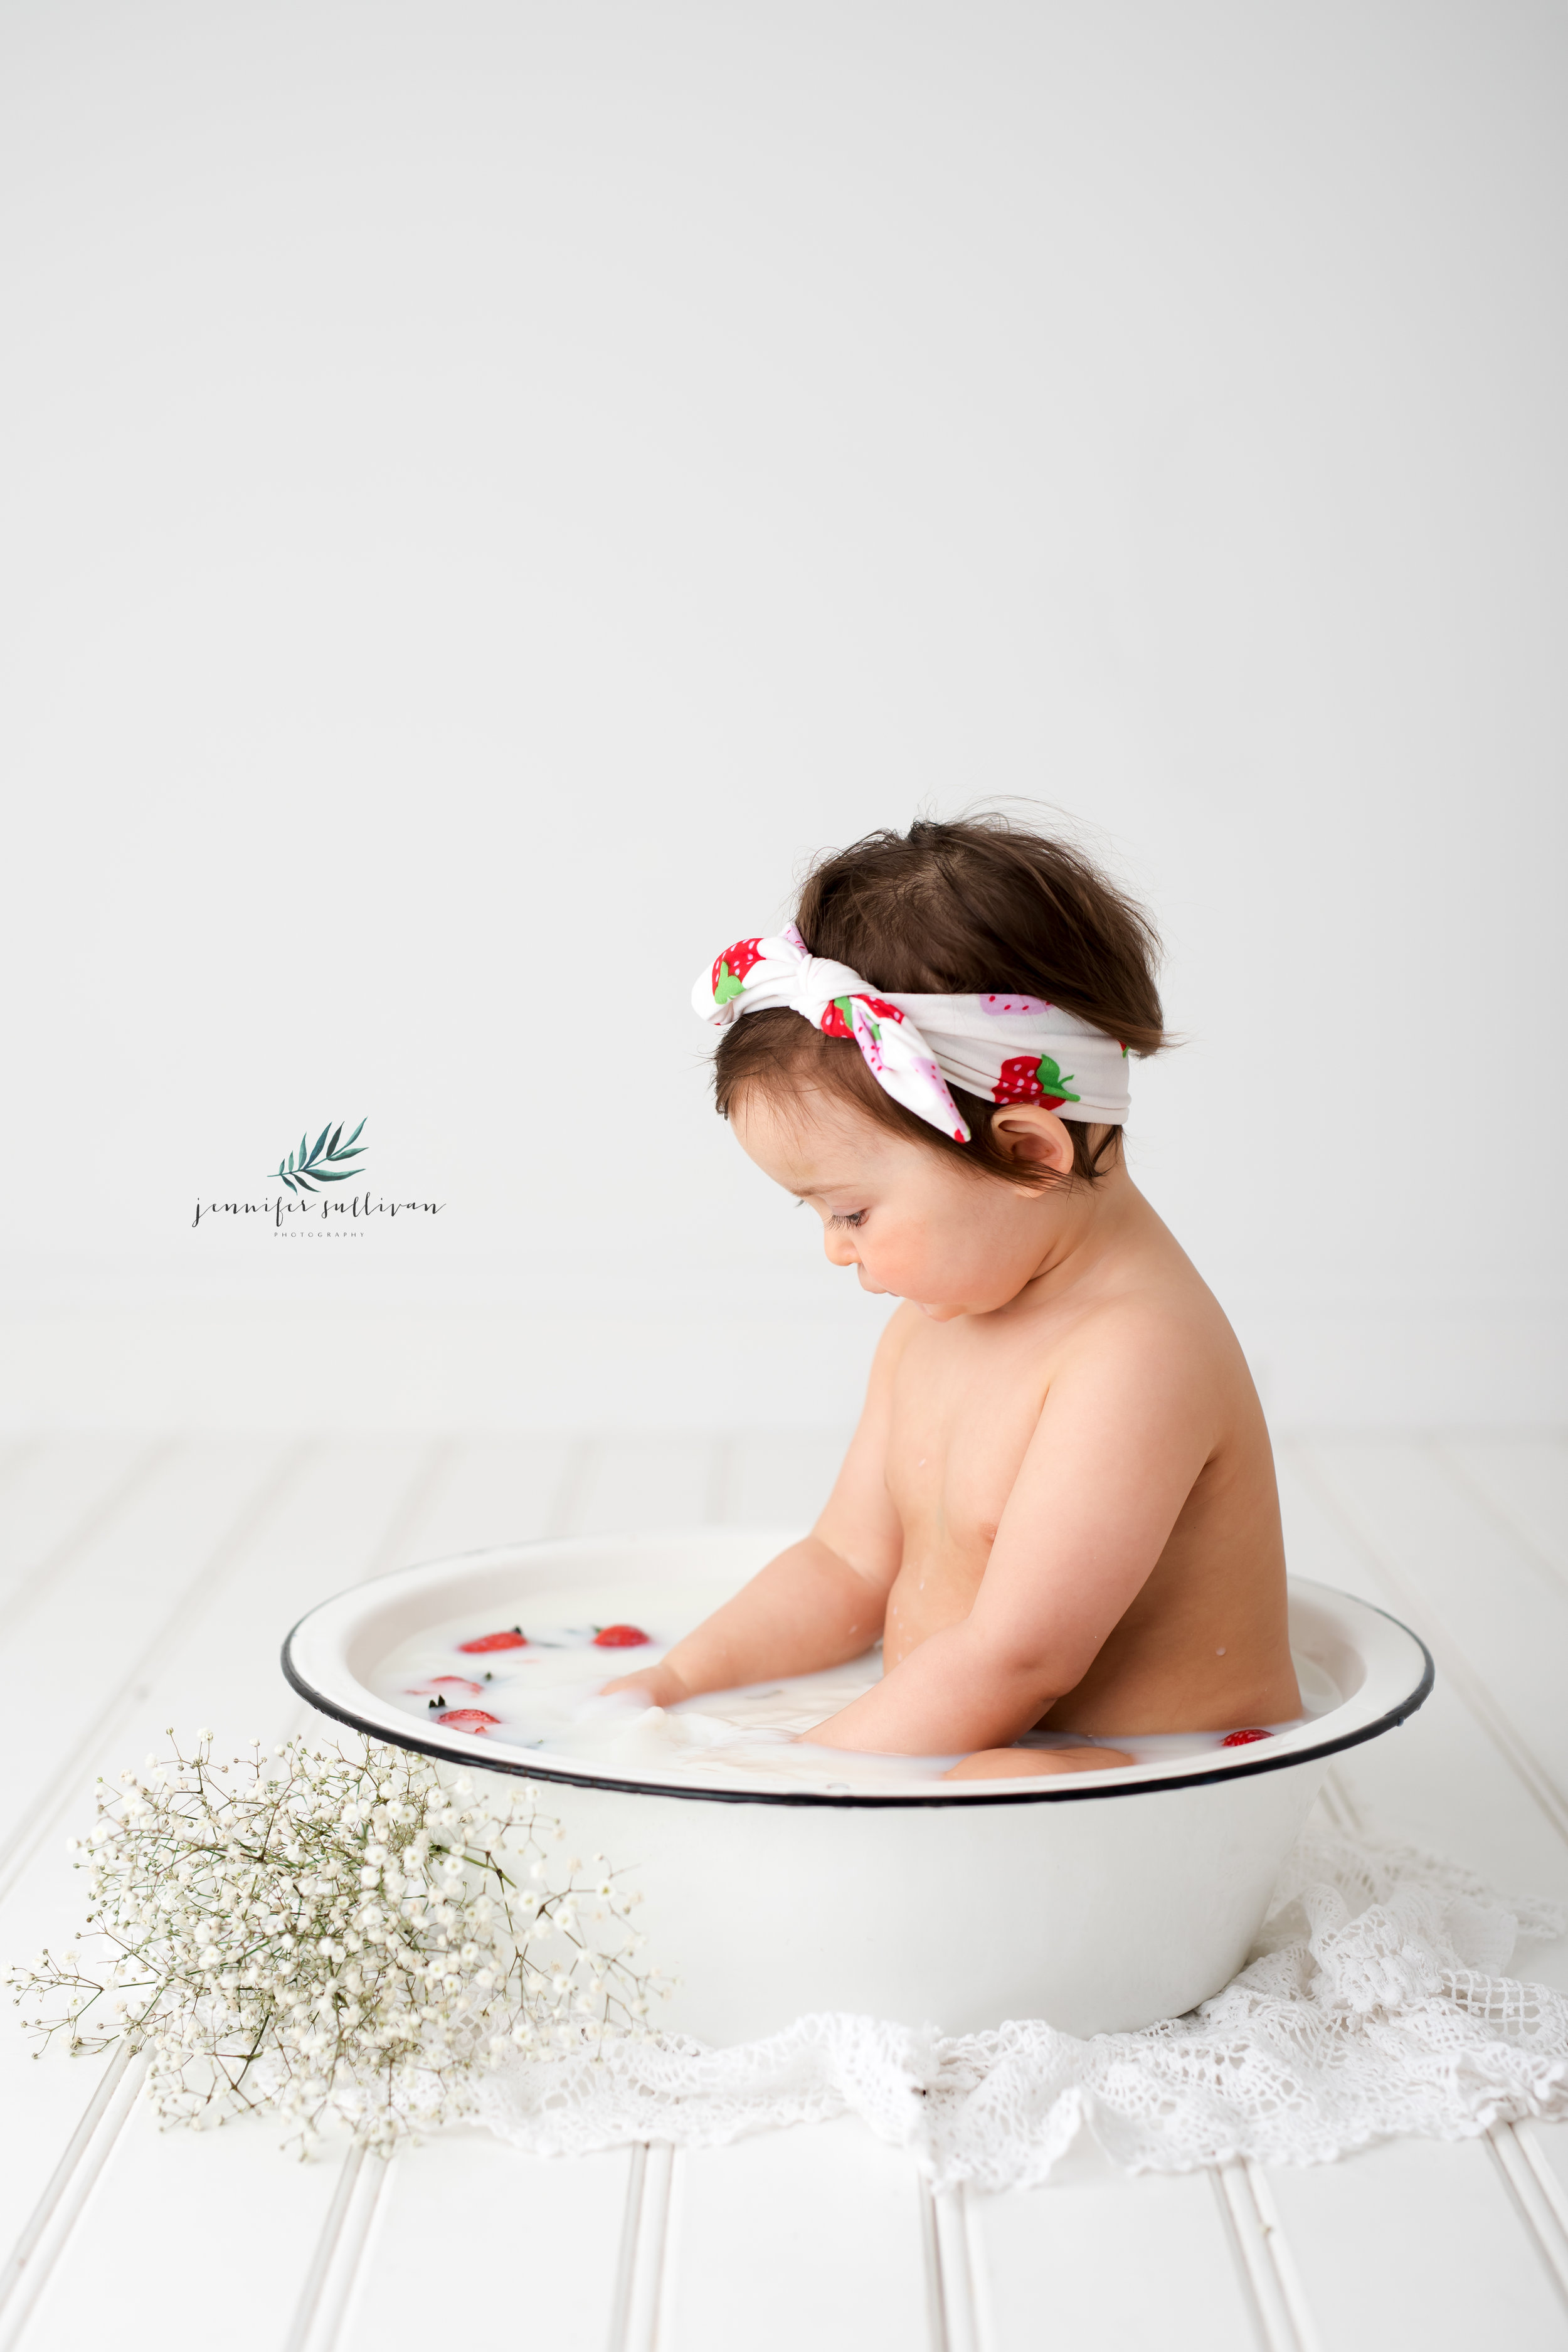 DARTMOUTH PHOTOGRAPHER CAKE-400-12.jpg